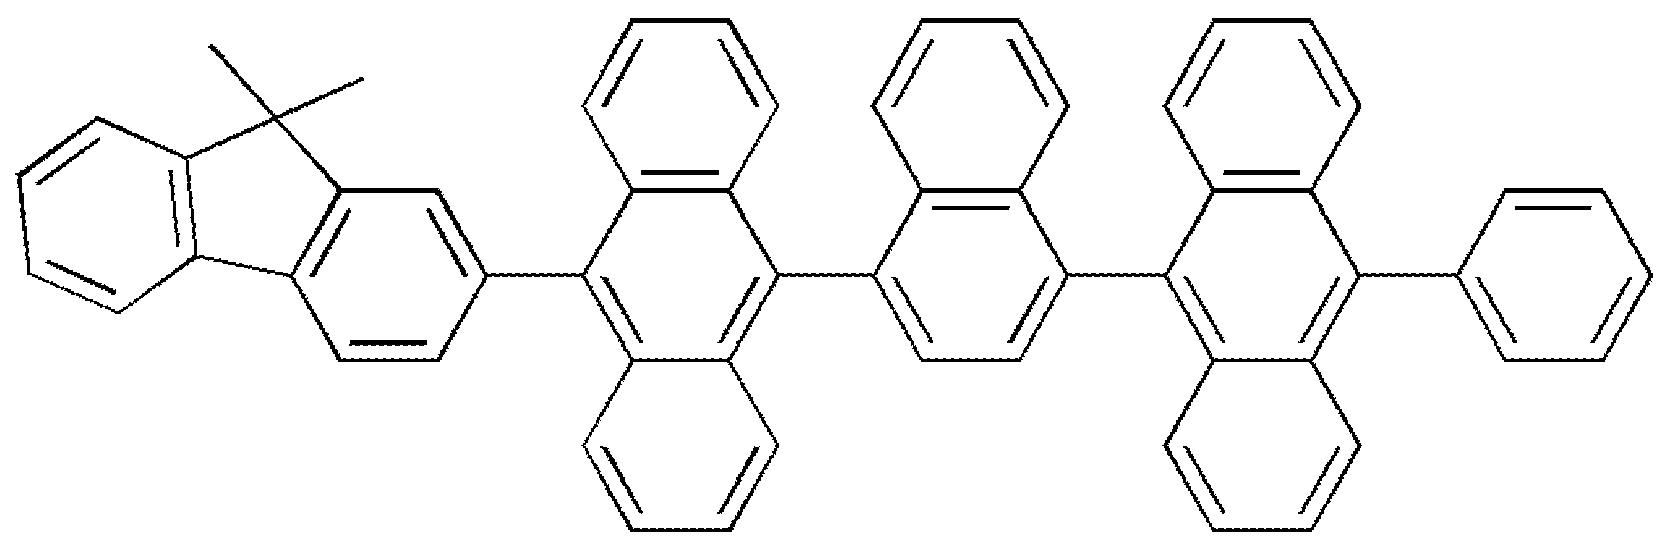 Figure 112007087103673-pat00662